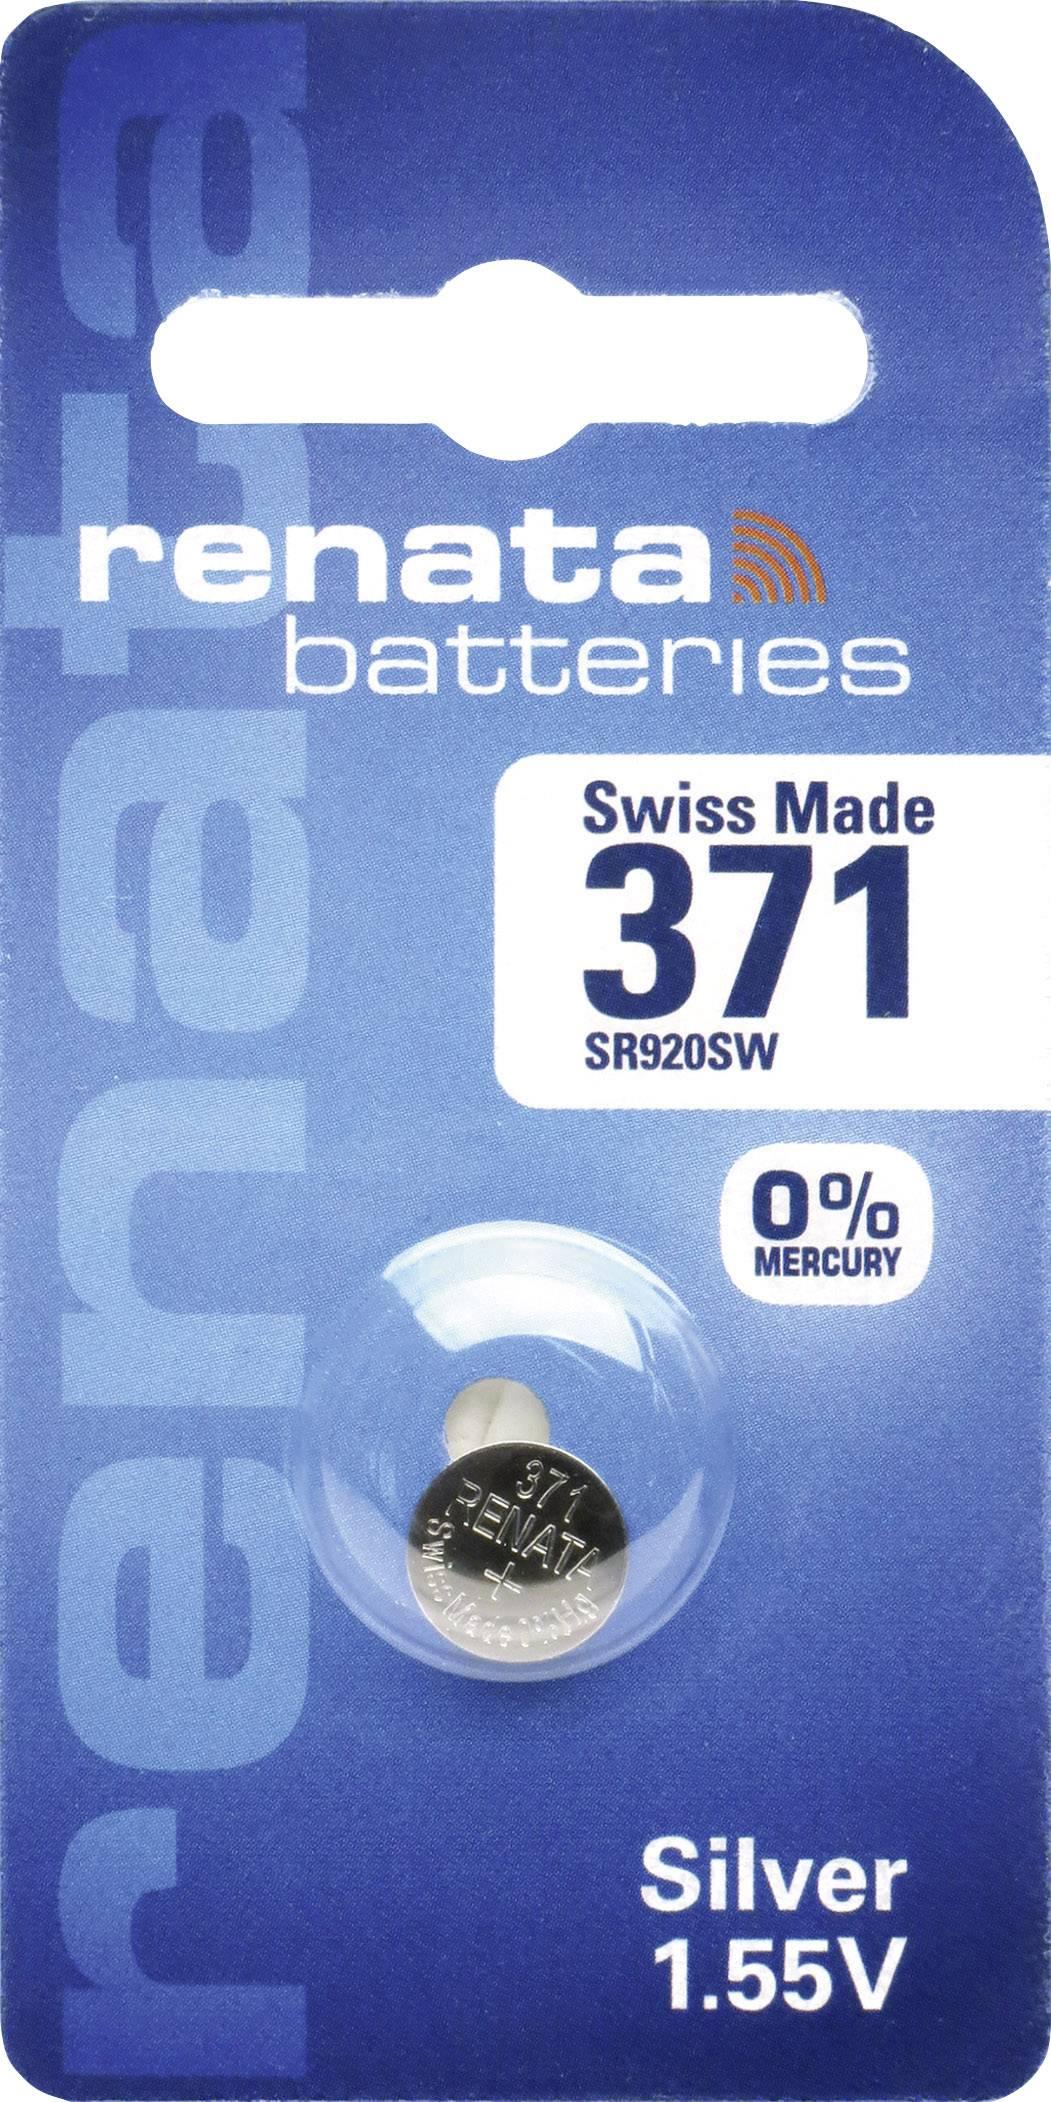 Knoflíková baterie 371, Renata SR68, na bázi oxidu stříbra, 371.CU MF